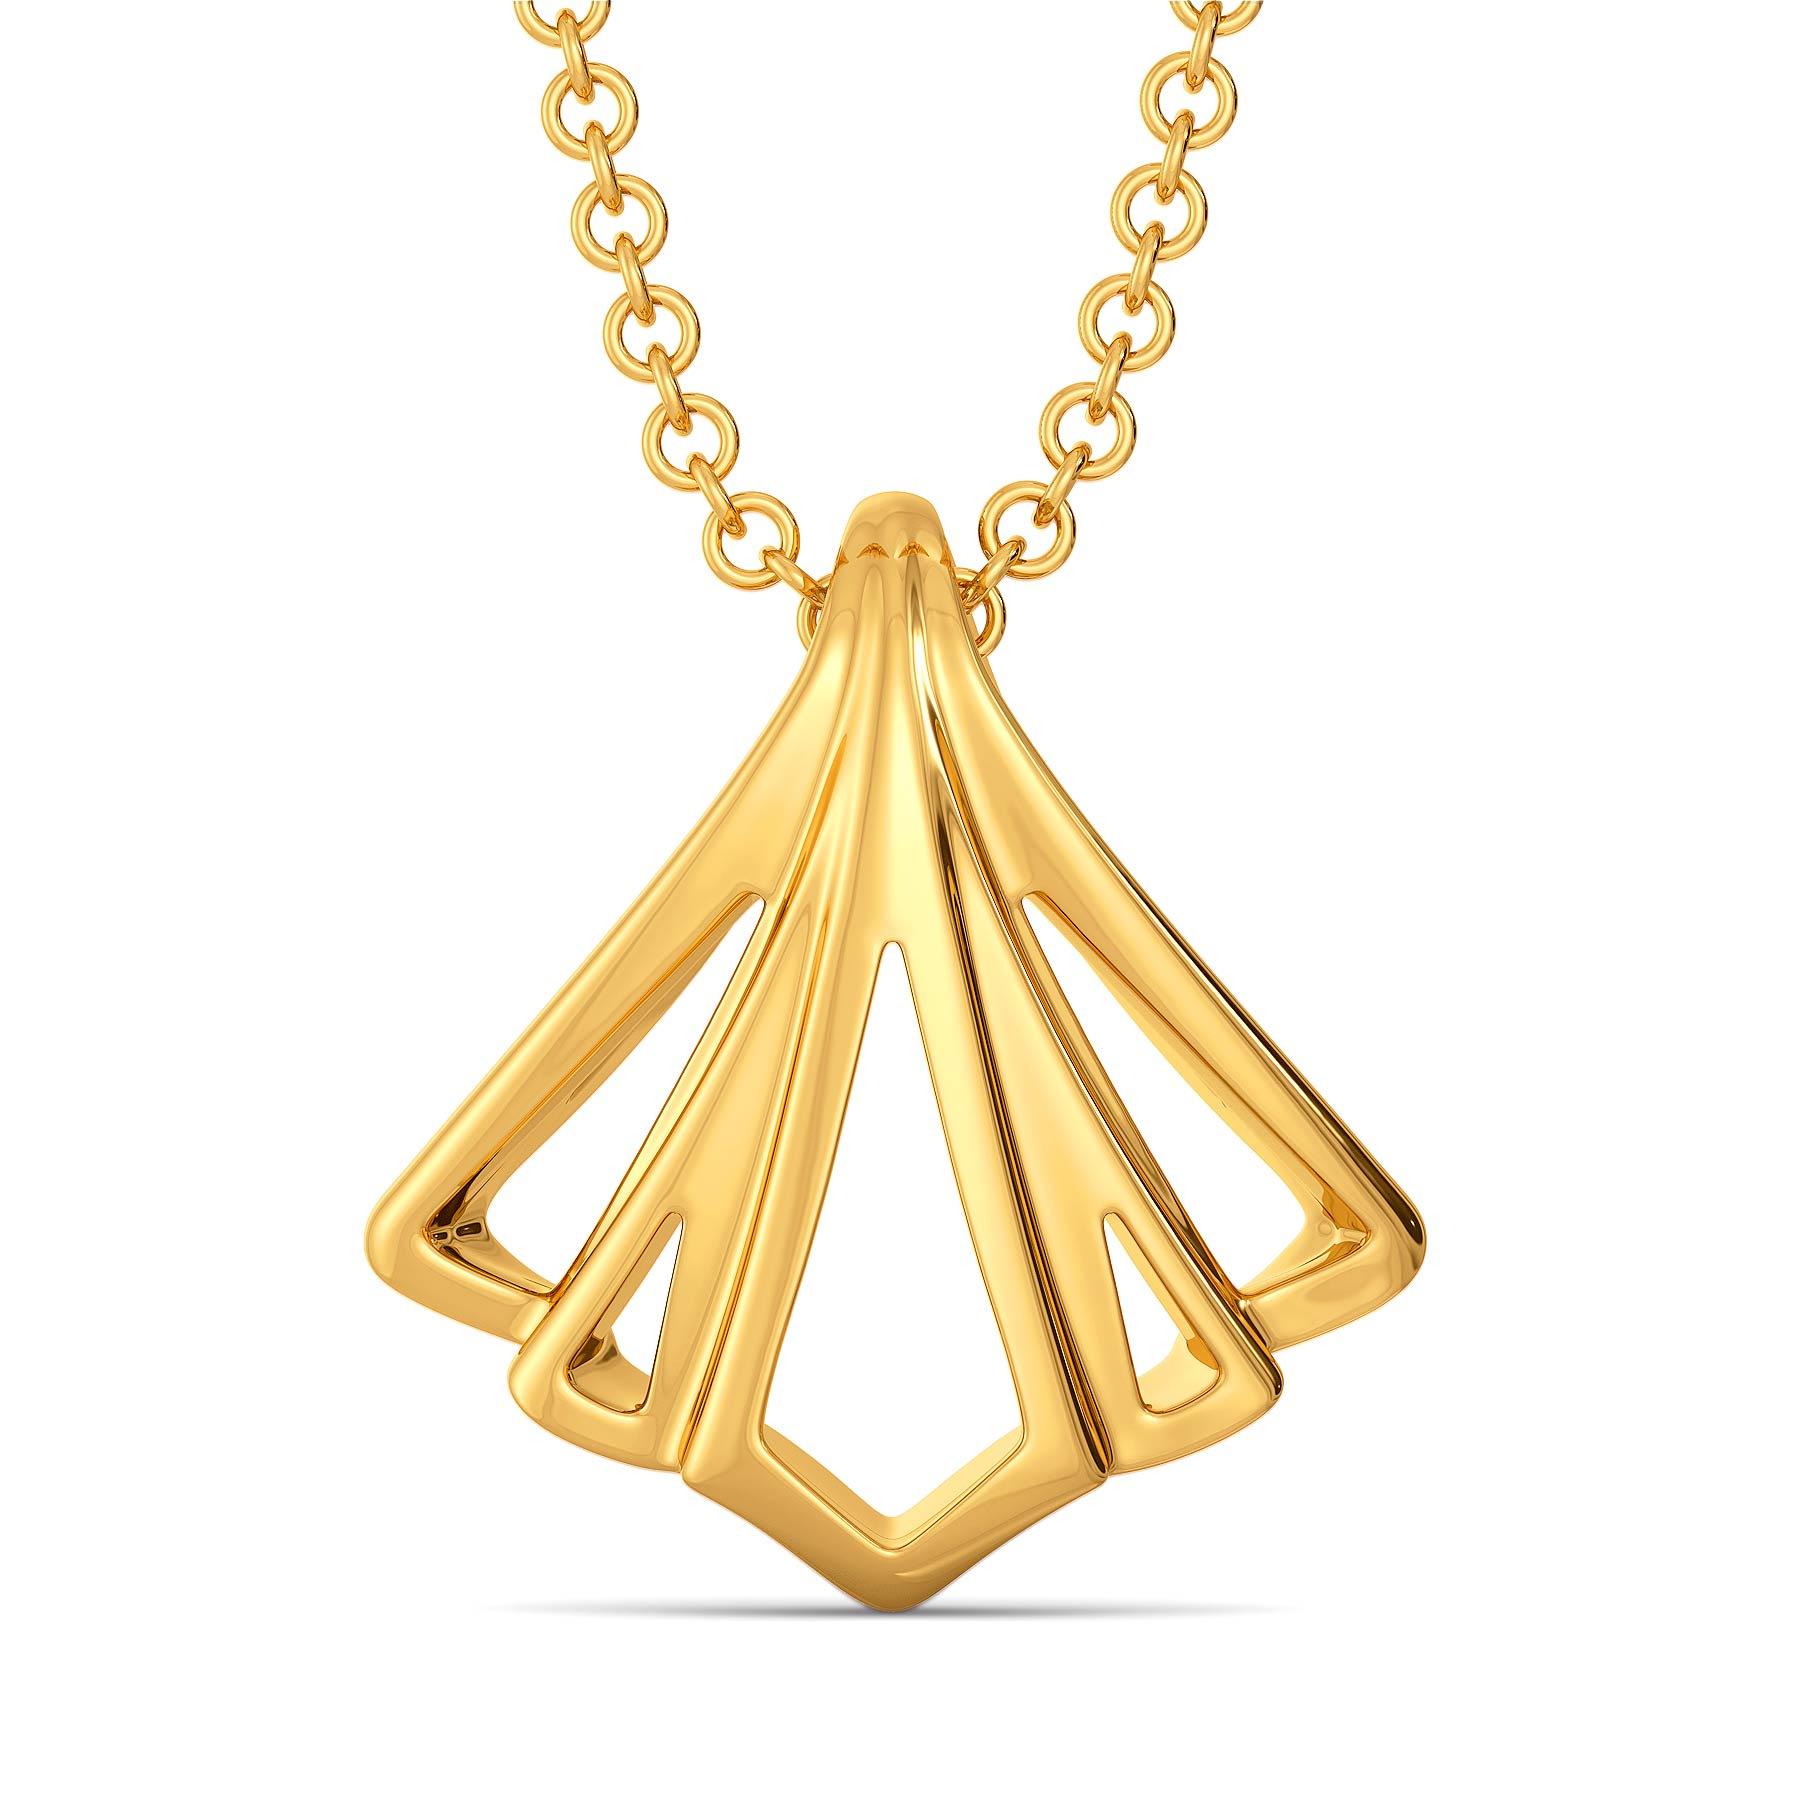 Drape Desires Gold Pendants